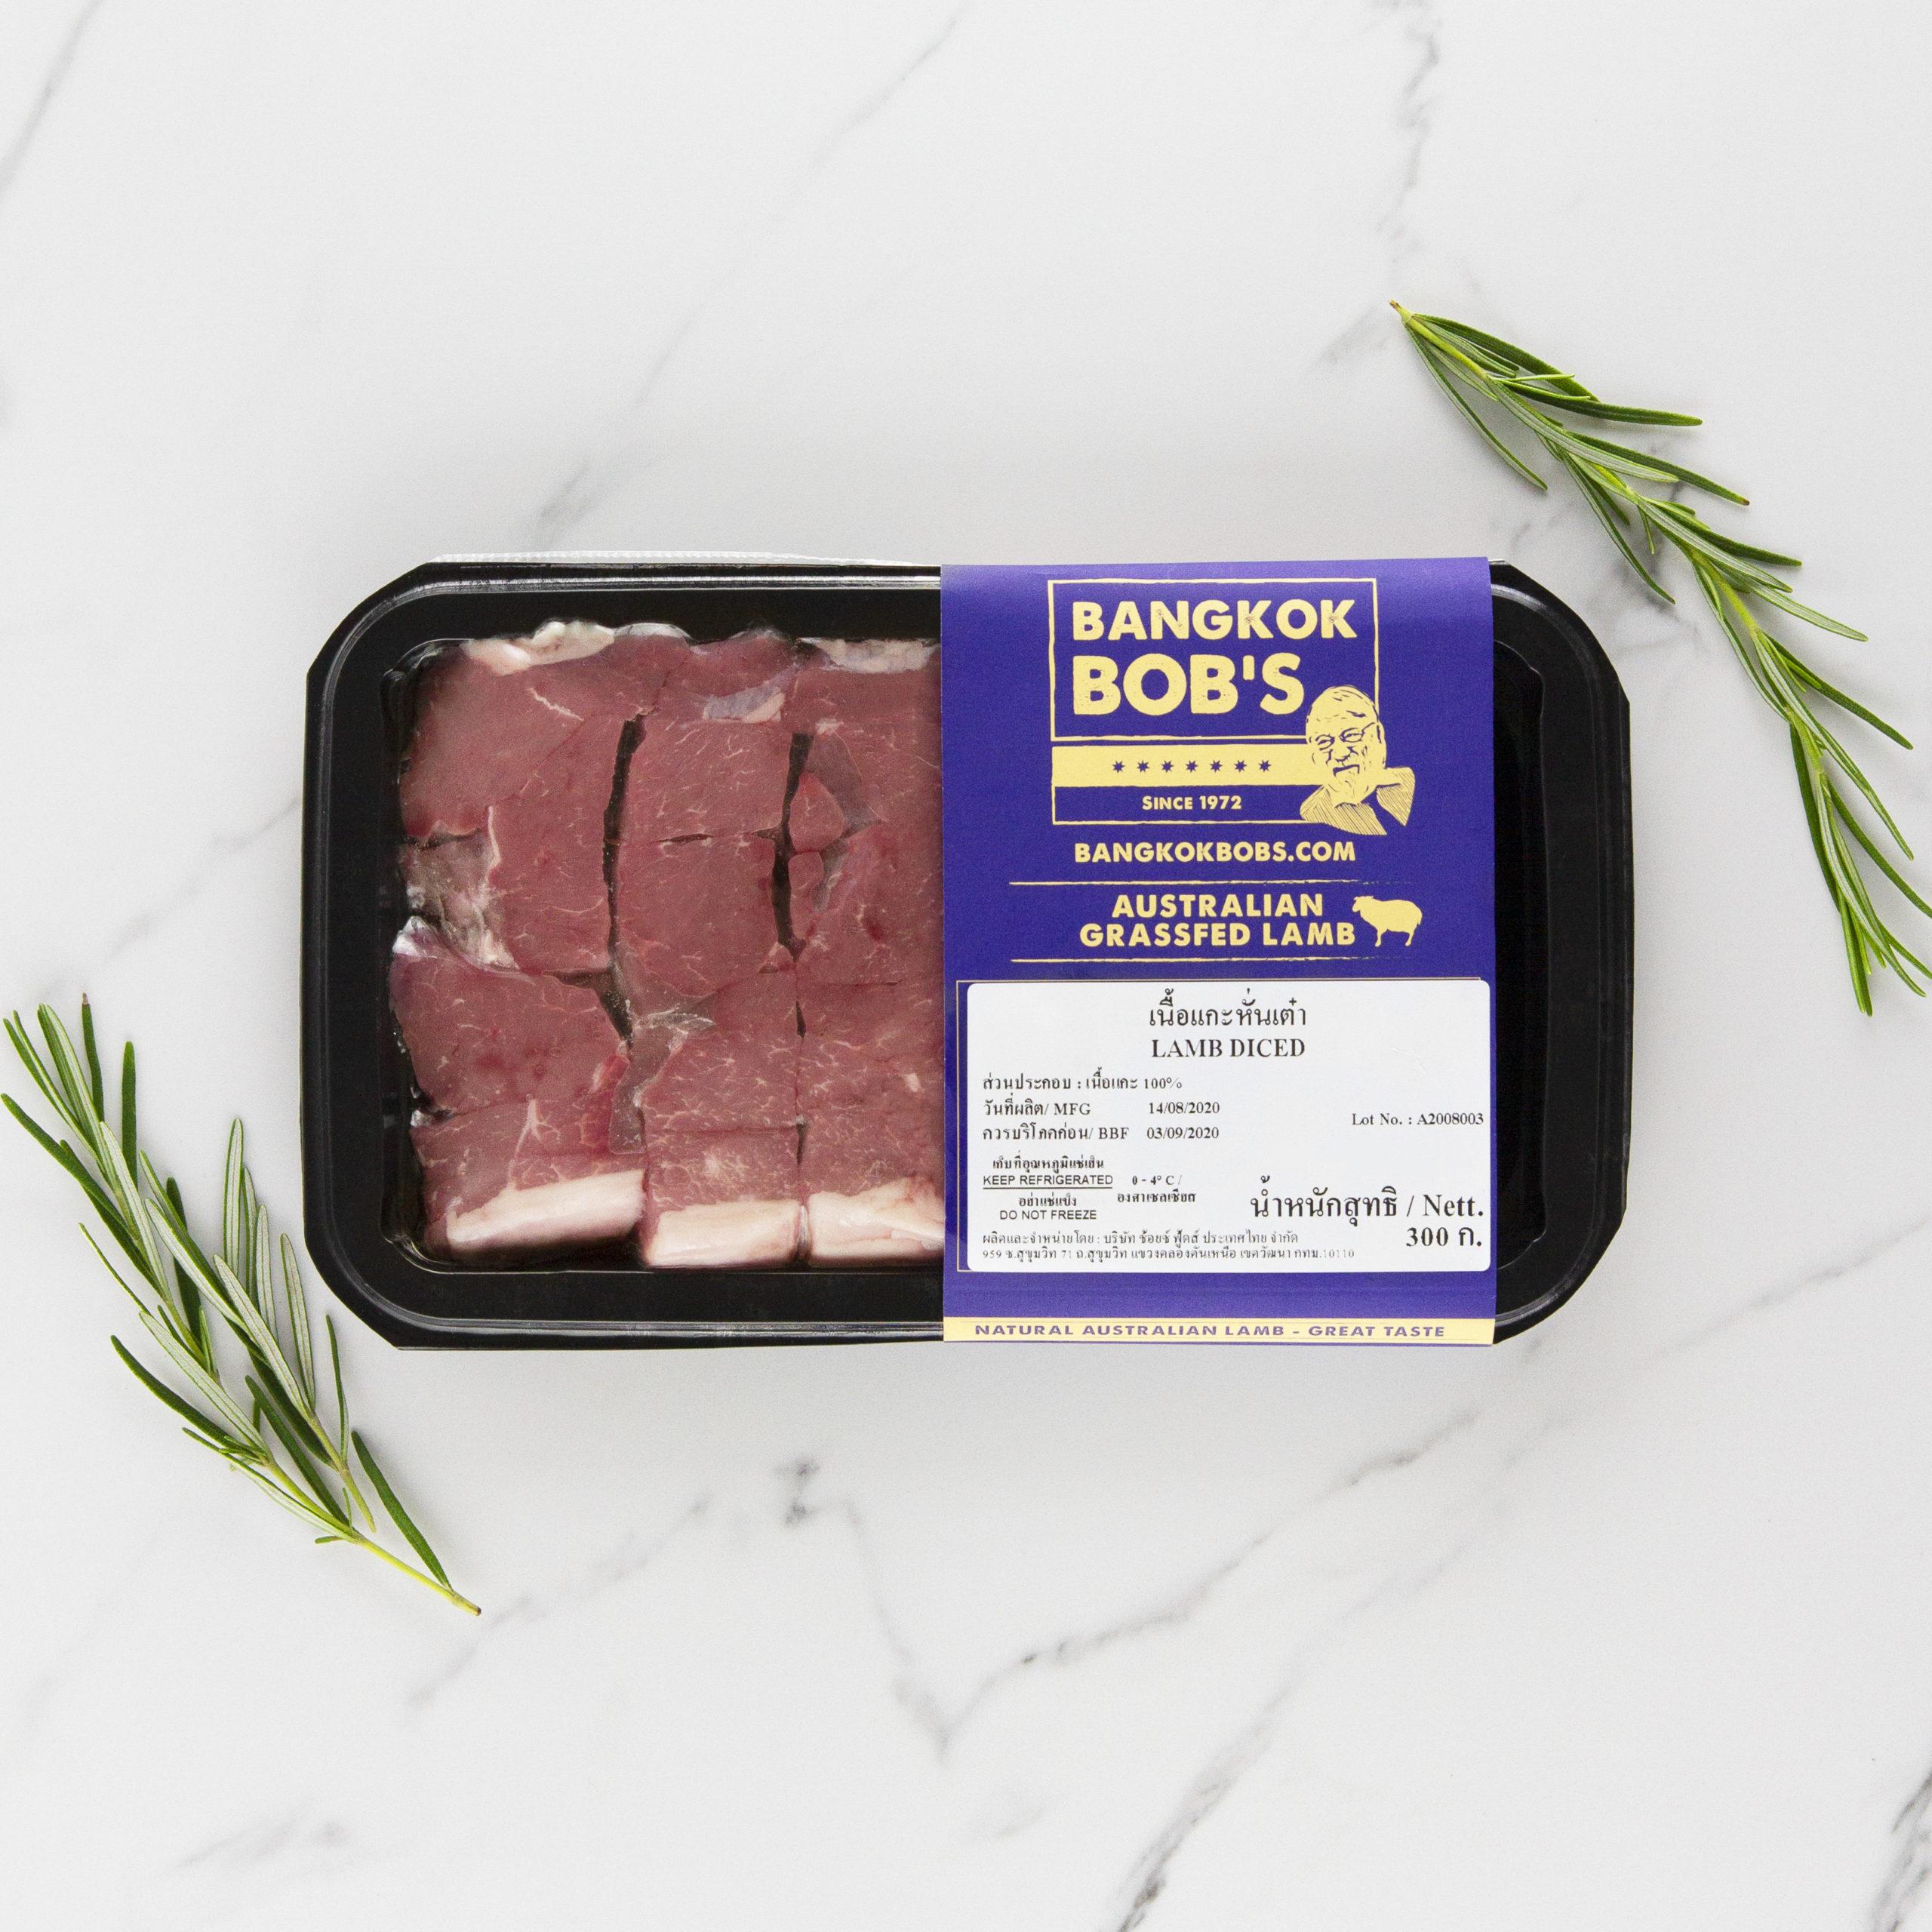 Diced Australian Grassfed Lamb in Bangkok Bob's packaging